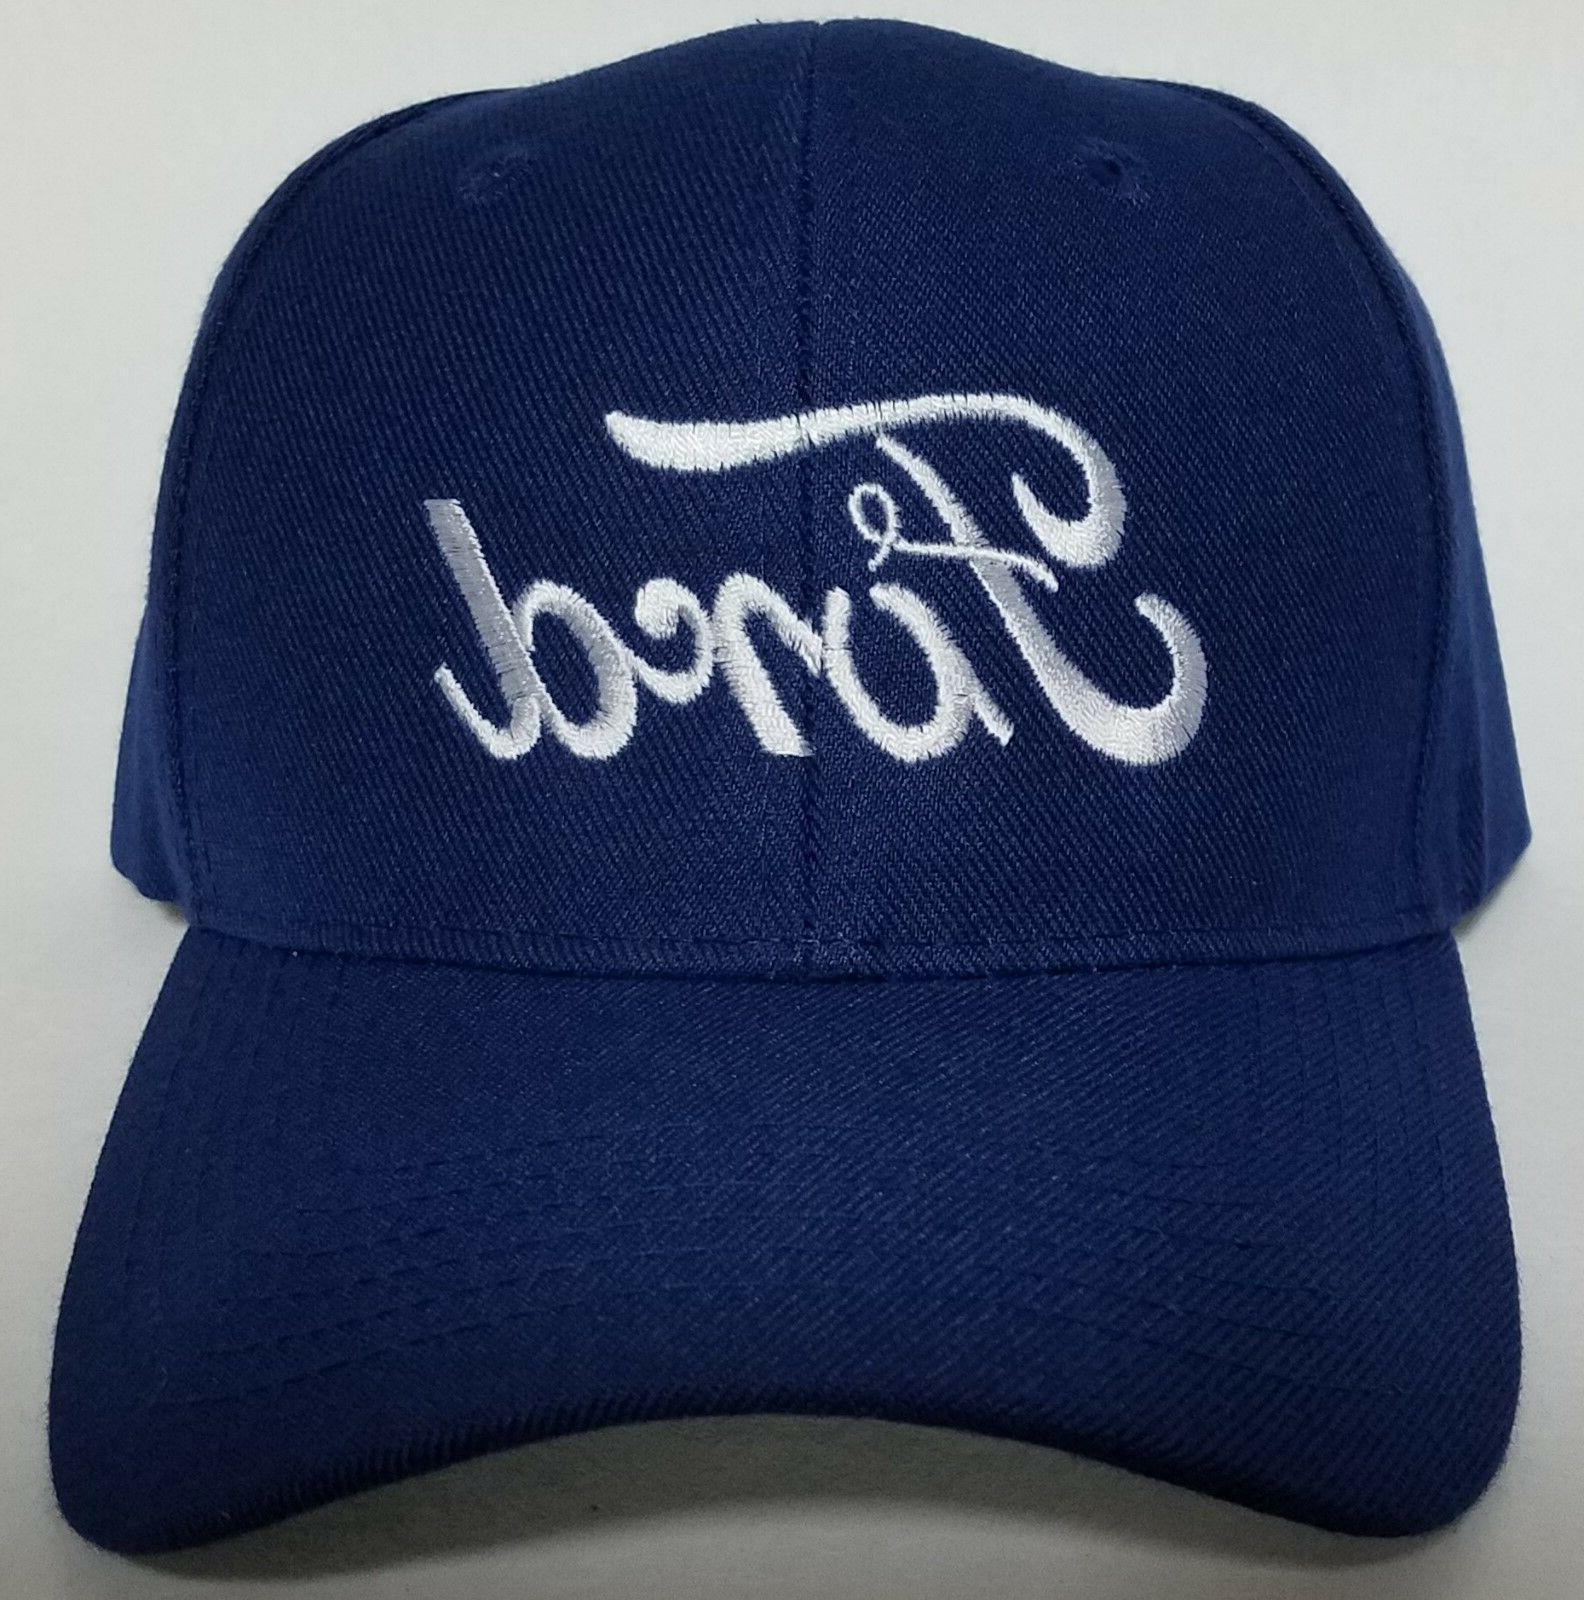 FORD Embroidered Baseball Hat Cap Adjustable